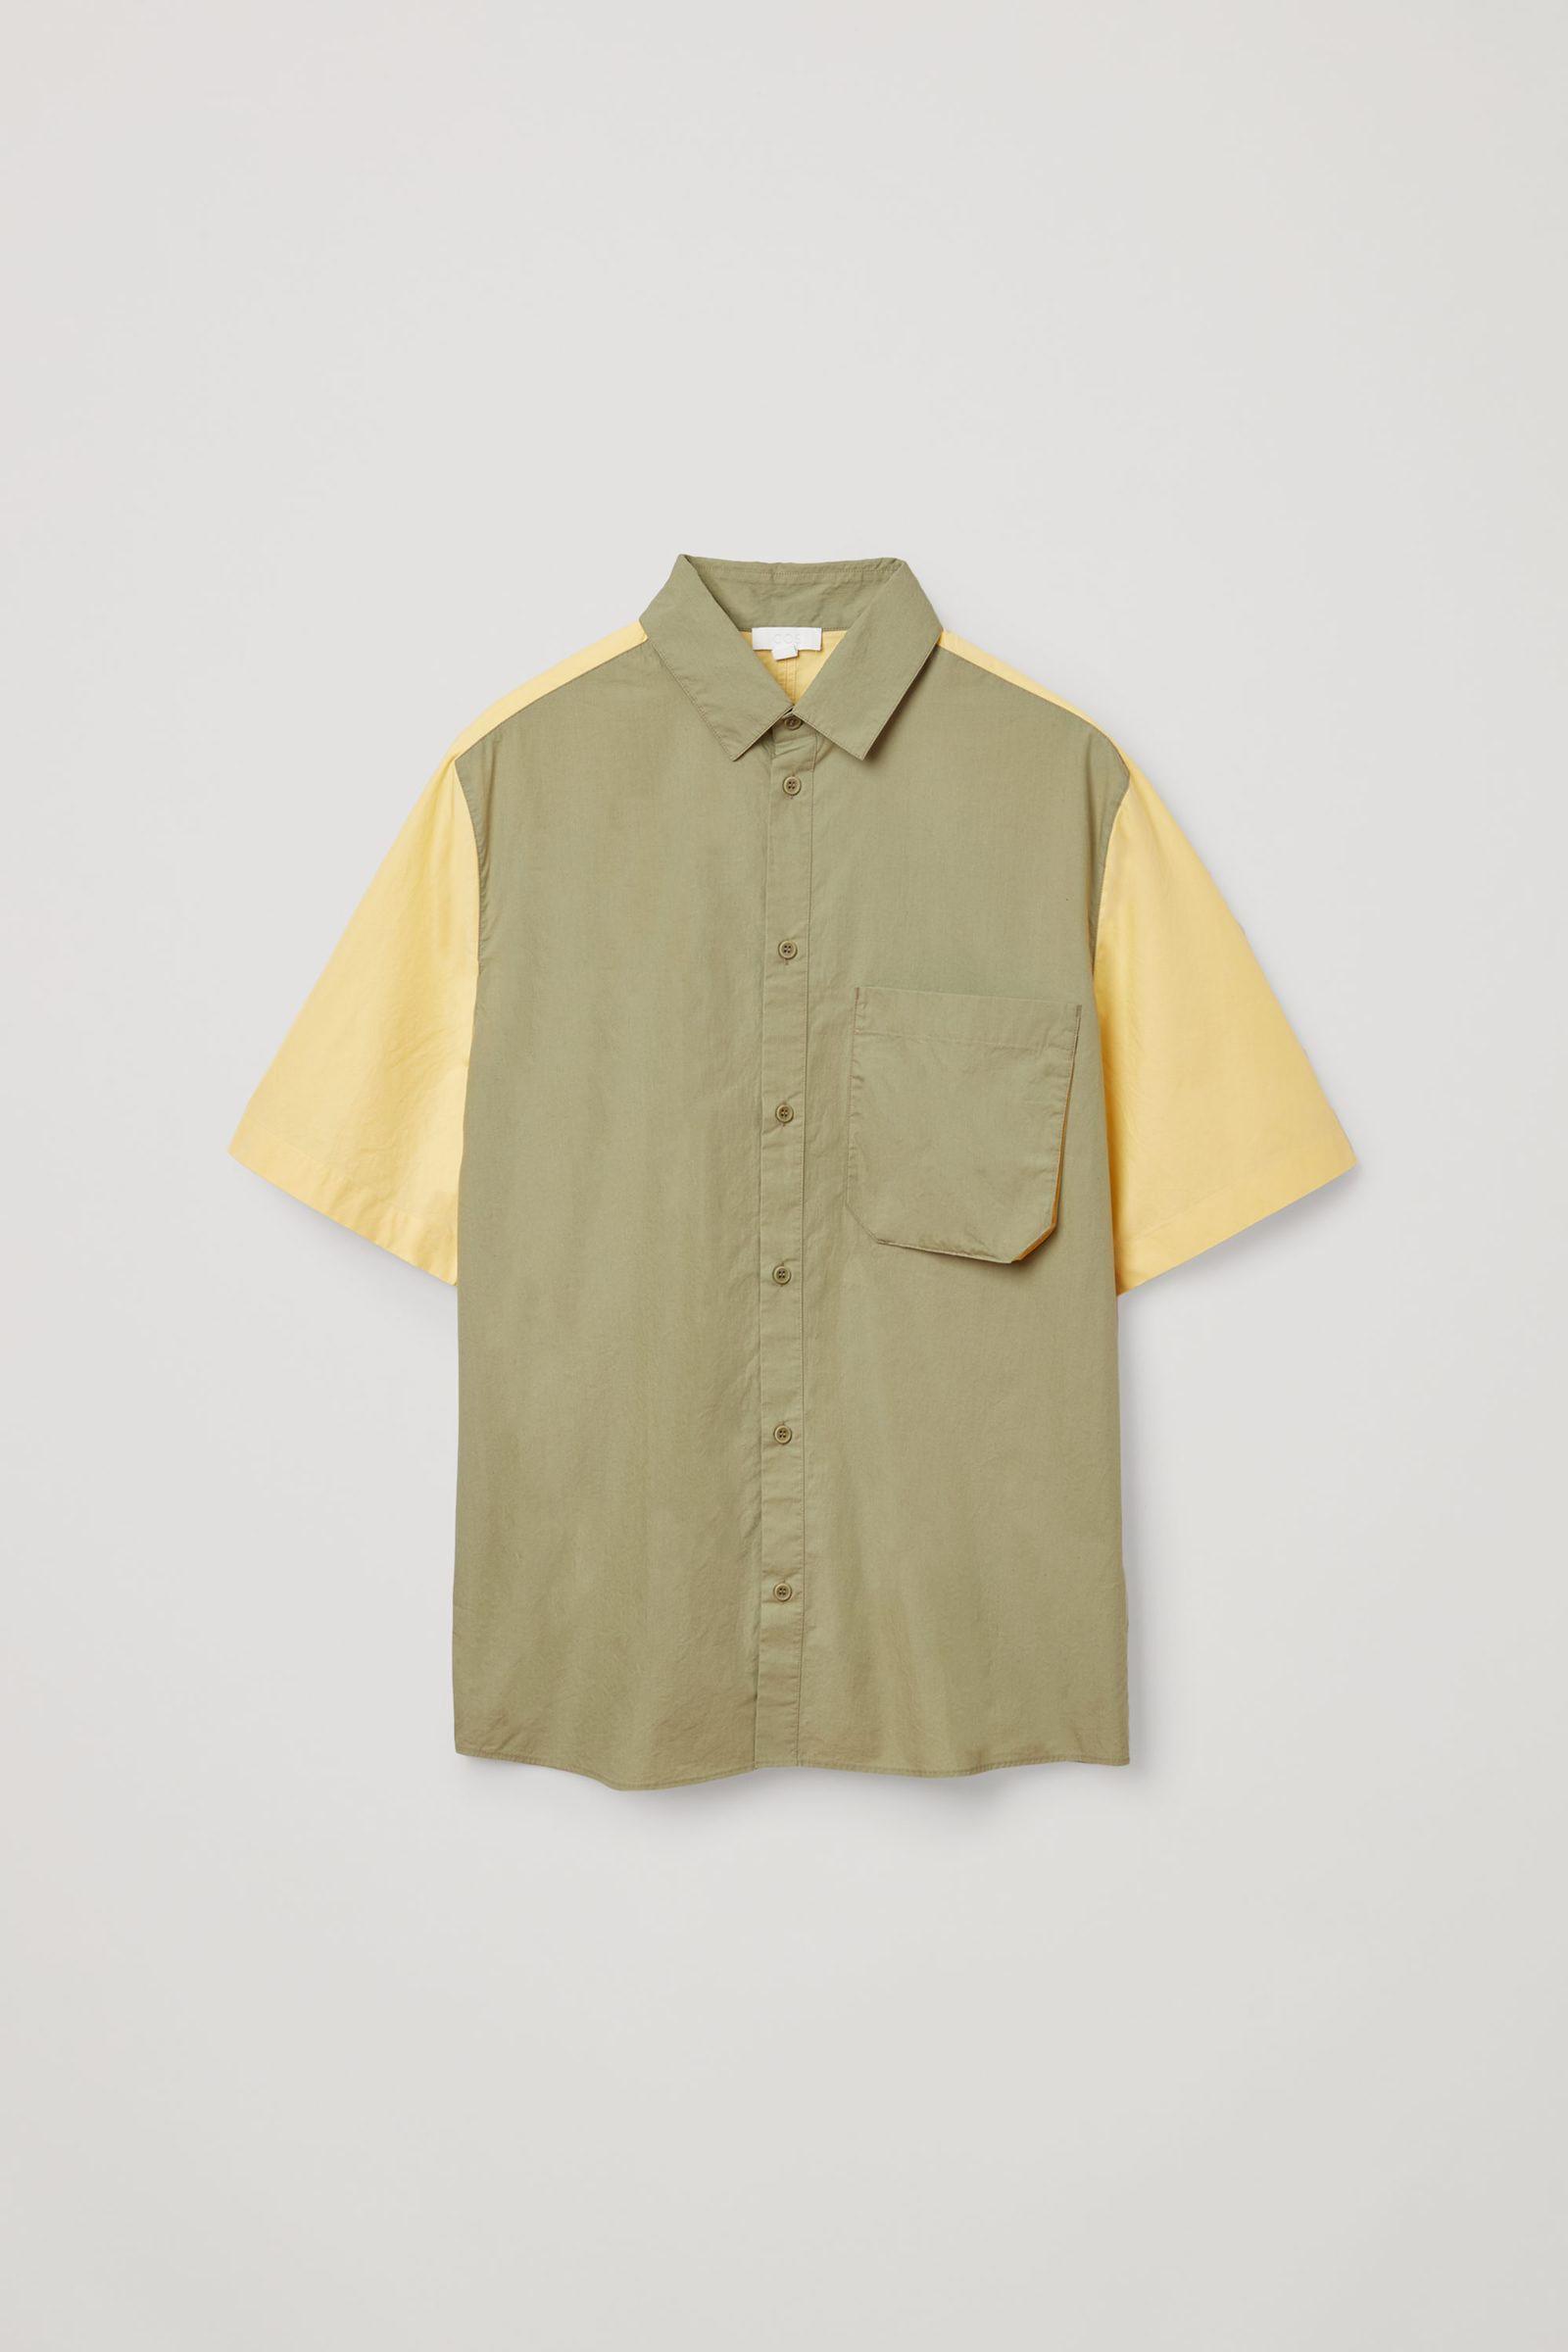 COS 오가닉 코튼 포플린 셔츠의 카키 그린컬러 Product입니다.